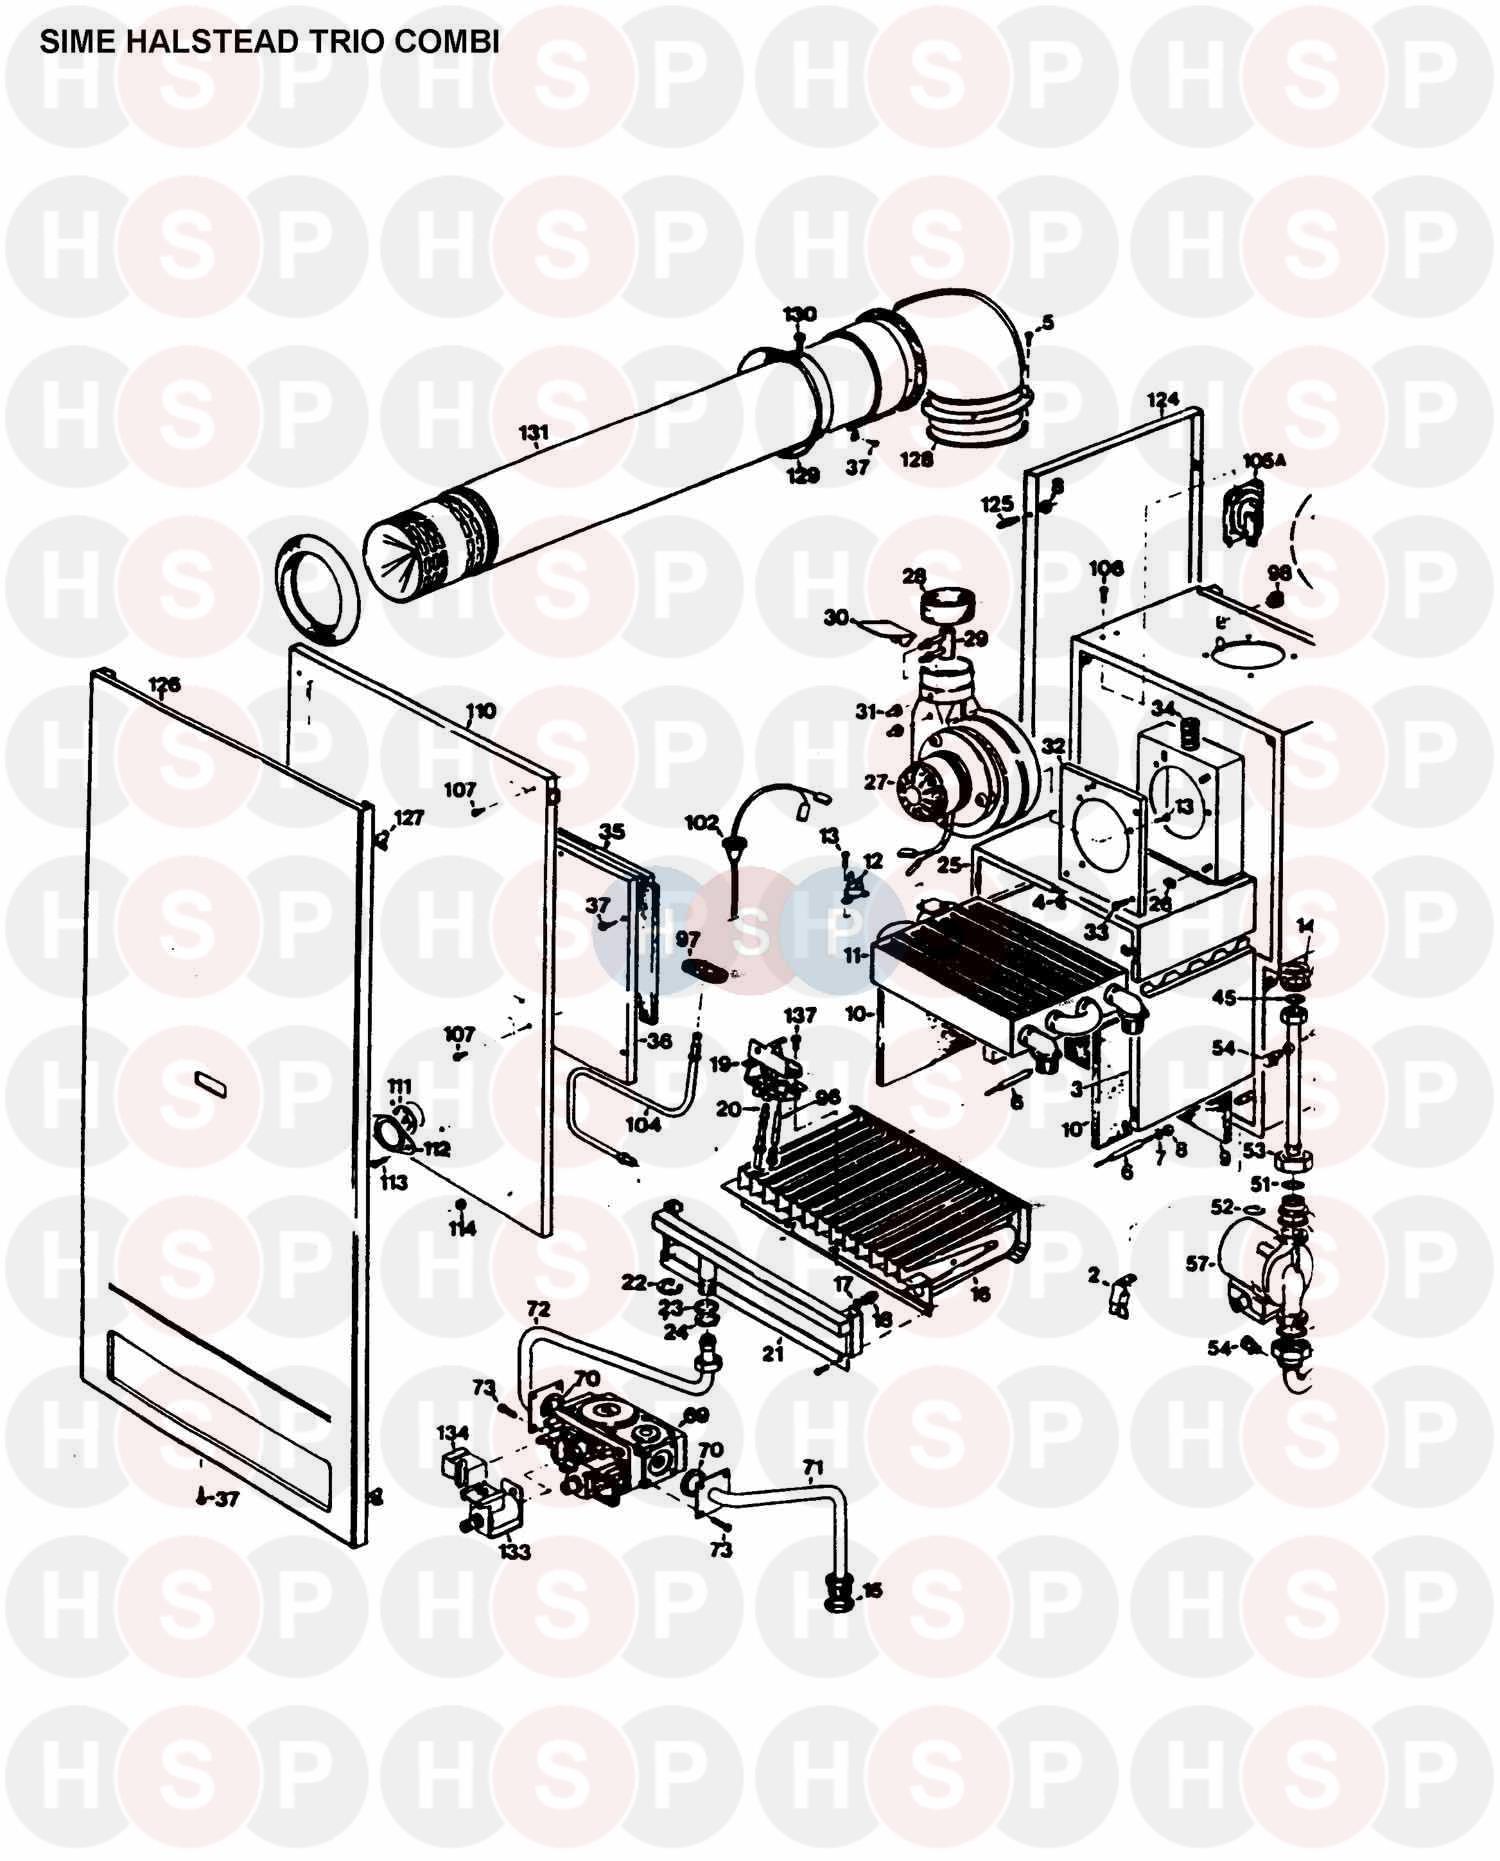 Prime Halstead Sime Halstead Trio Combi Boiler Assembly 1 Diagram Wiring 101 Kniepimsautoservicenl